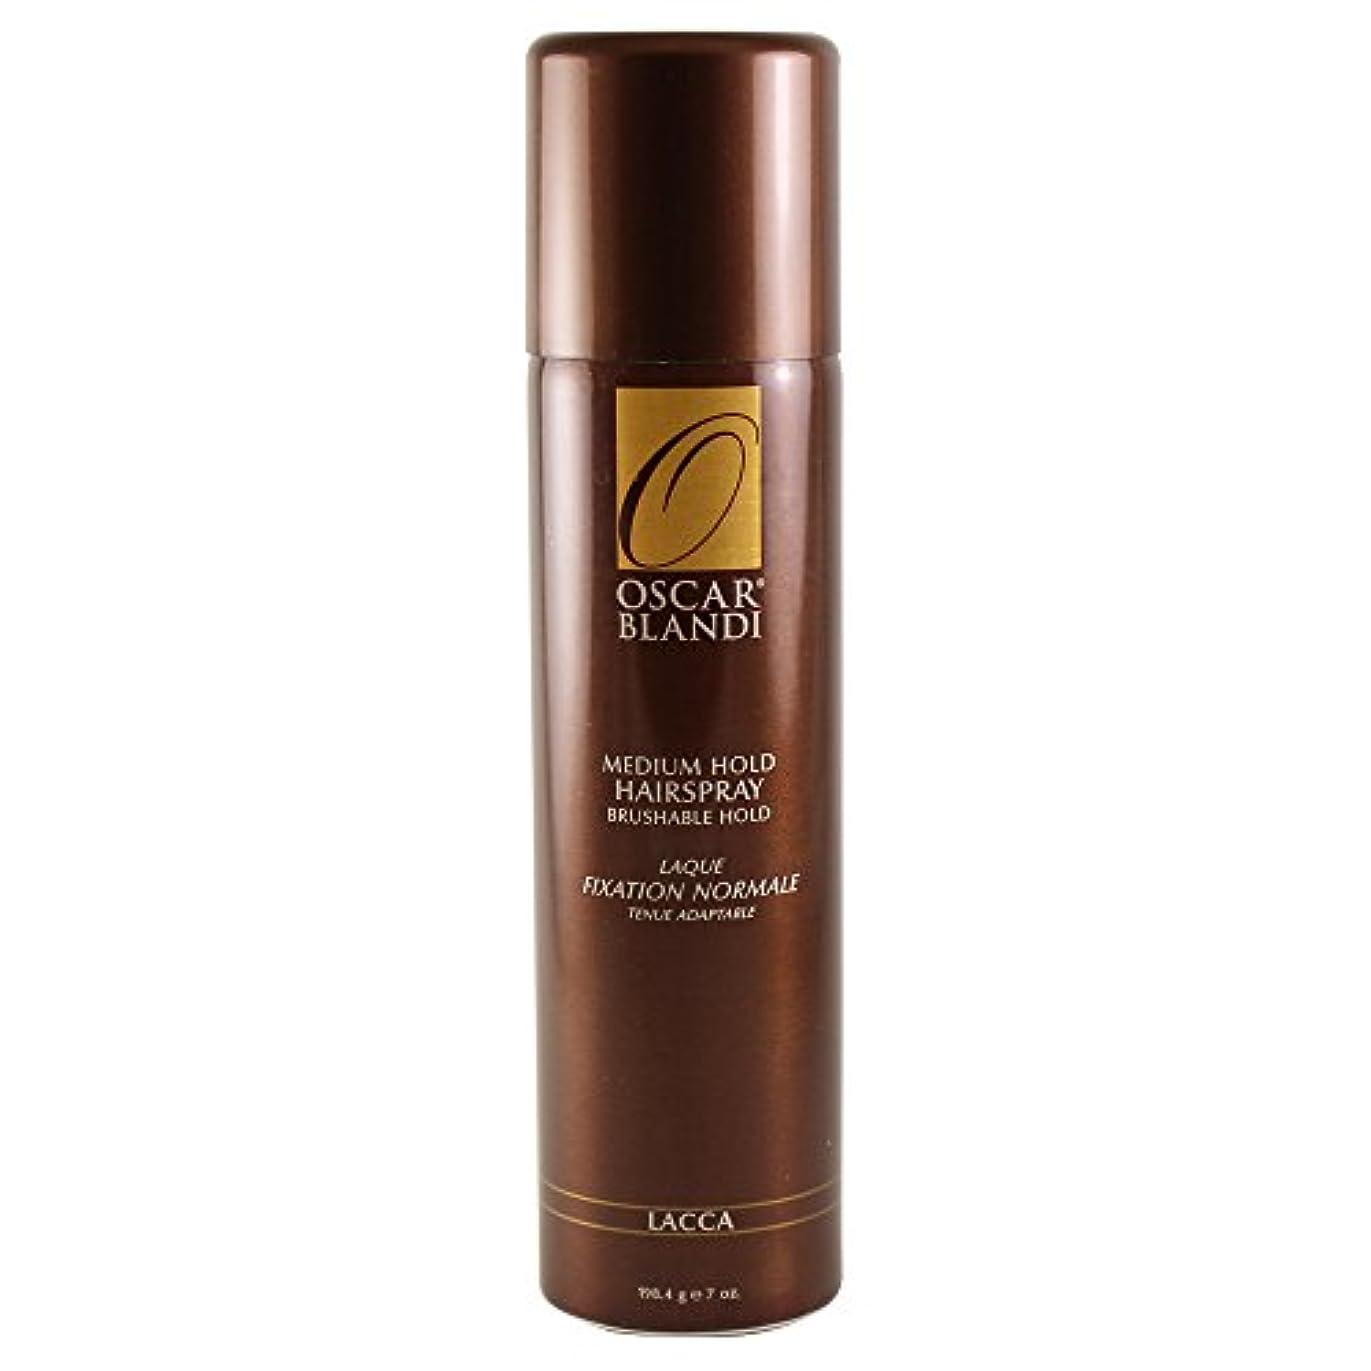 反論者締める効率的にOscar Blandi Lacca Medium Hold Hairspray - 7 Oz. (並行輸入品)